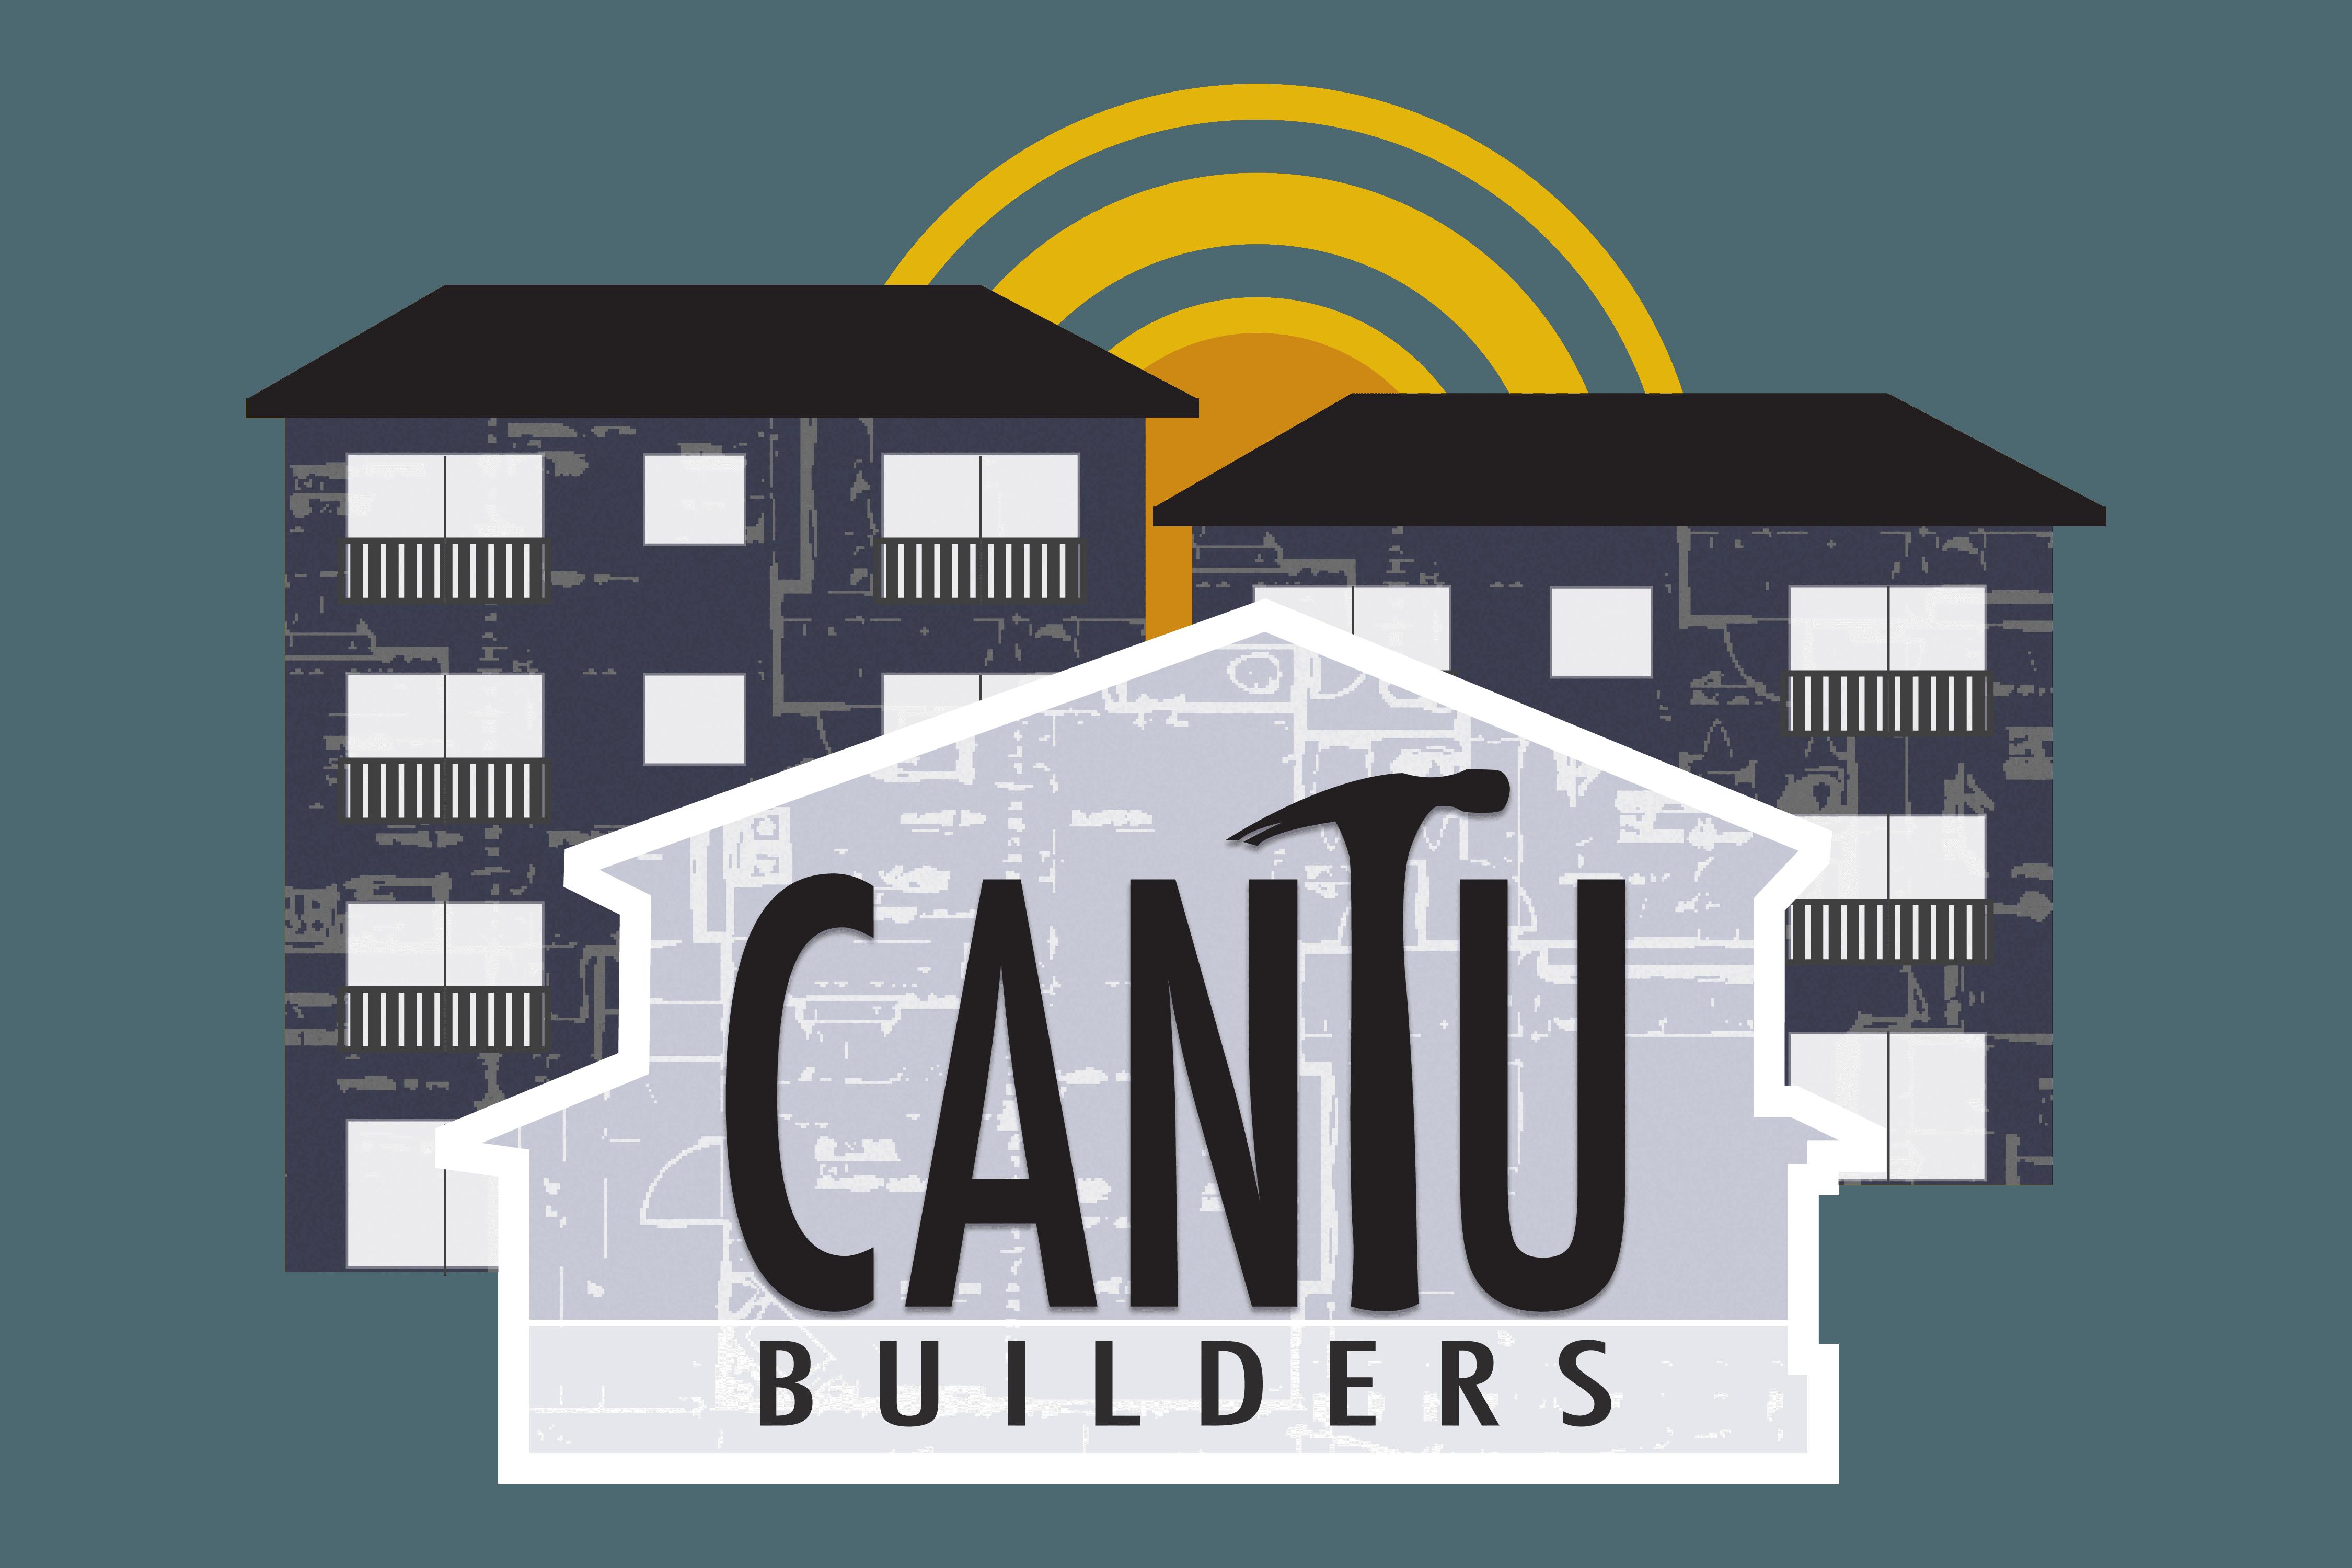 home wwwcantubuilderscom